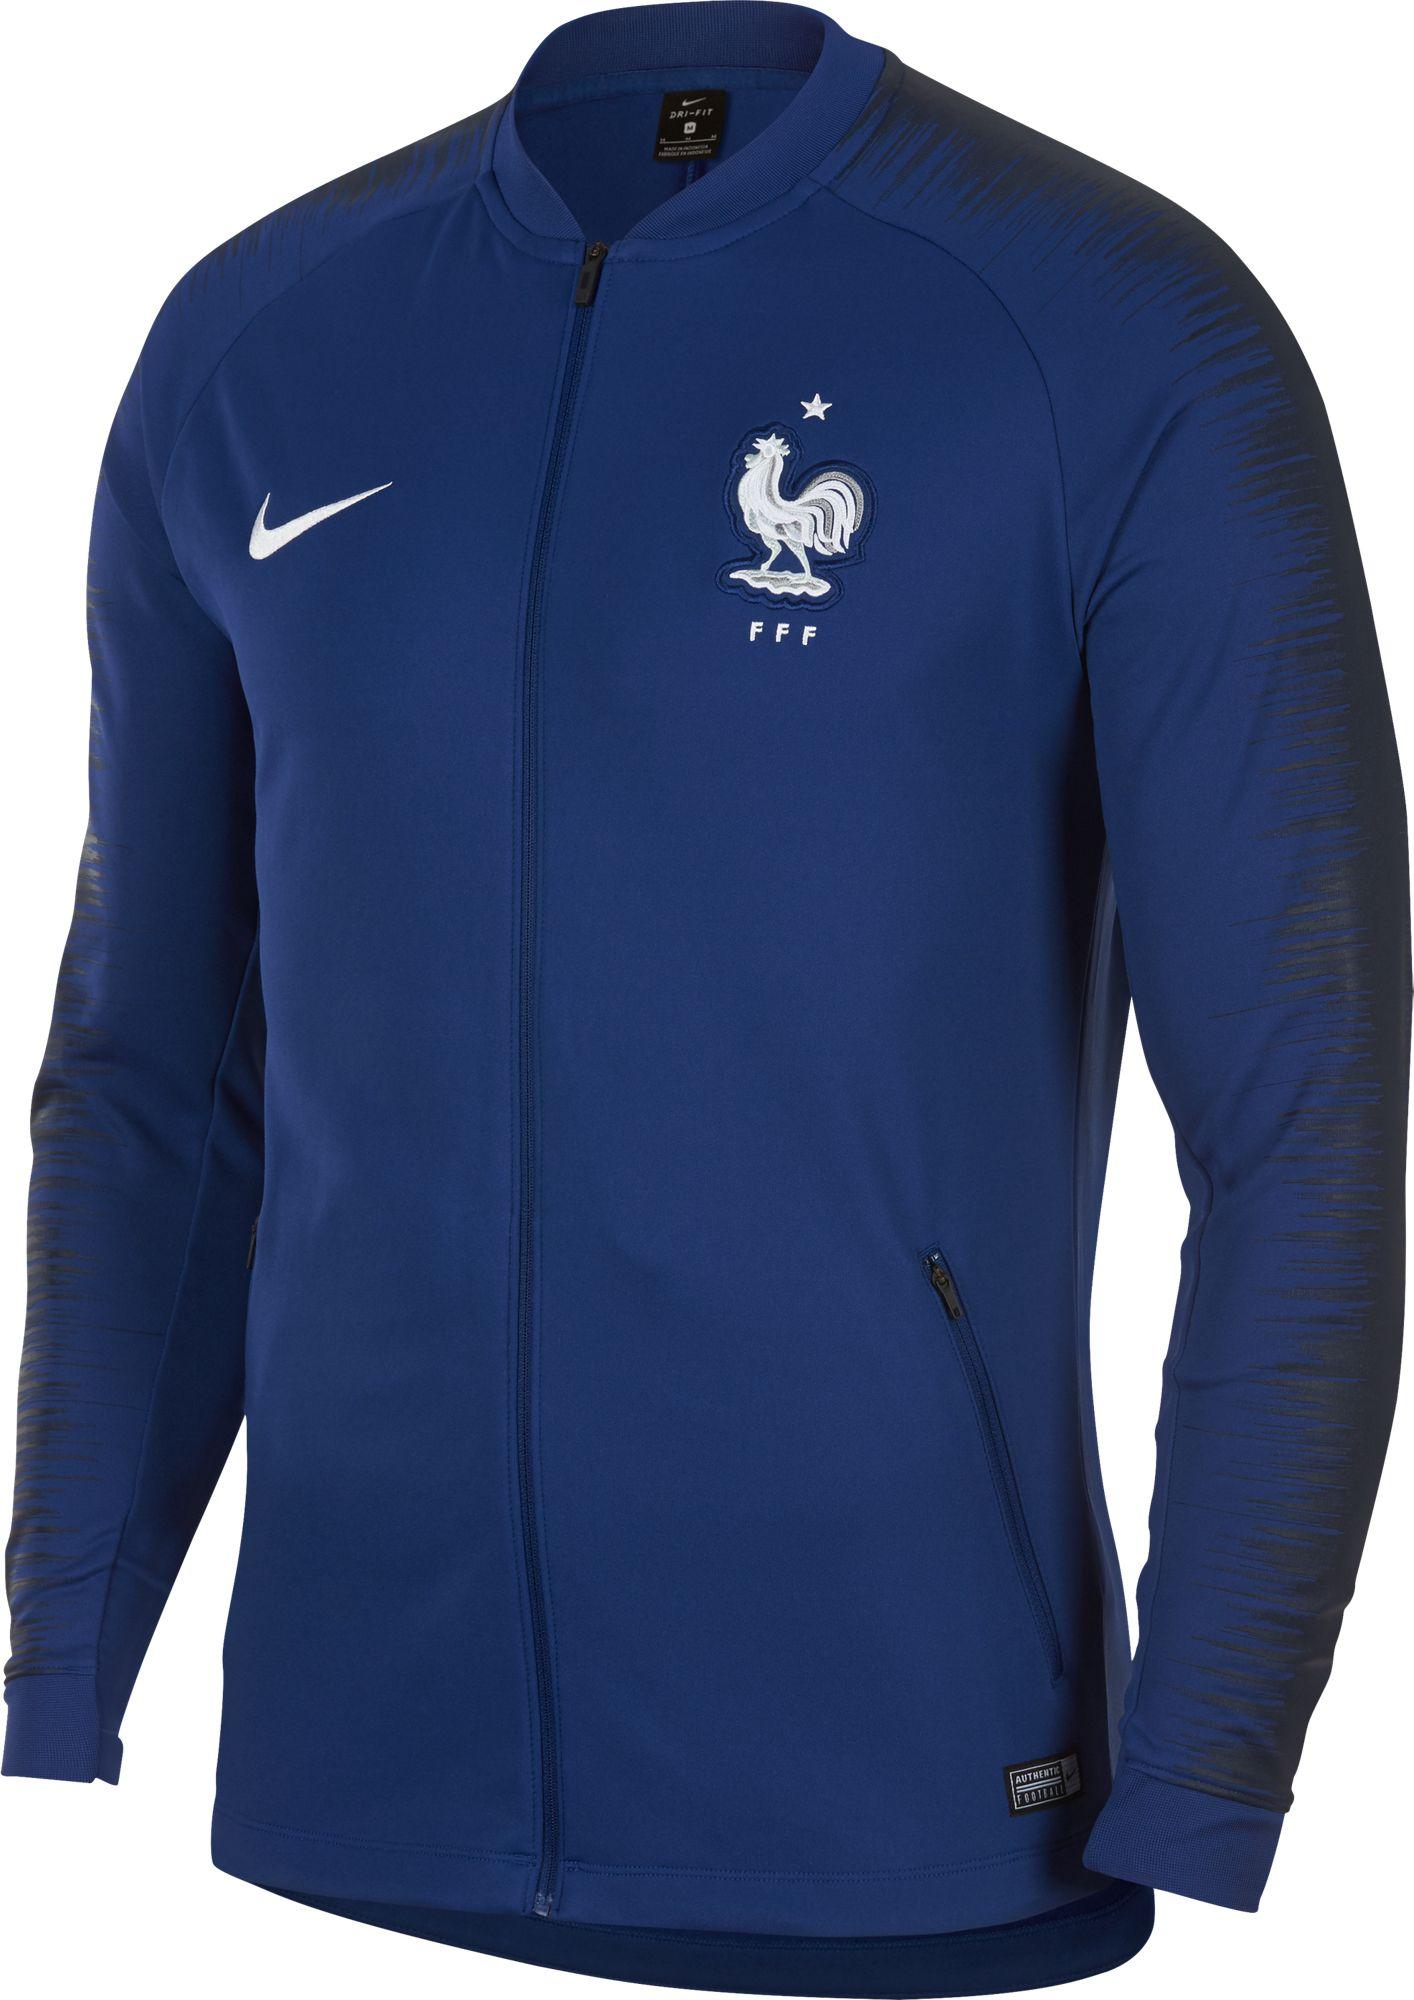 on sale 2ff99 411f3 Nike Men's 2018 Fifa World Cup France Anthem Full-Zip Jacket ...